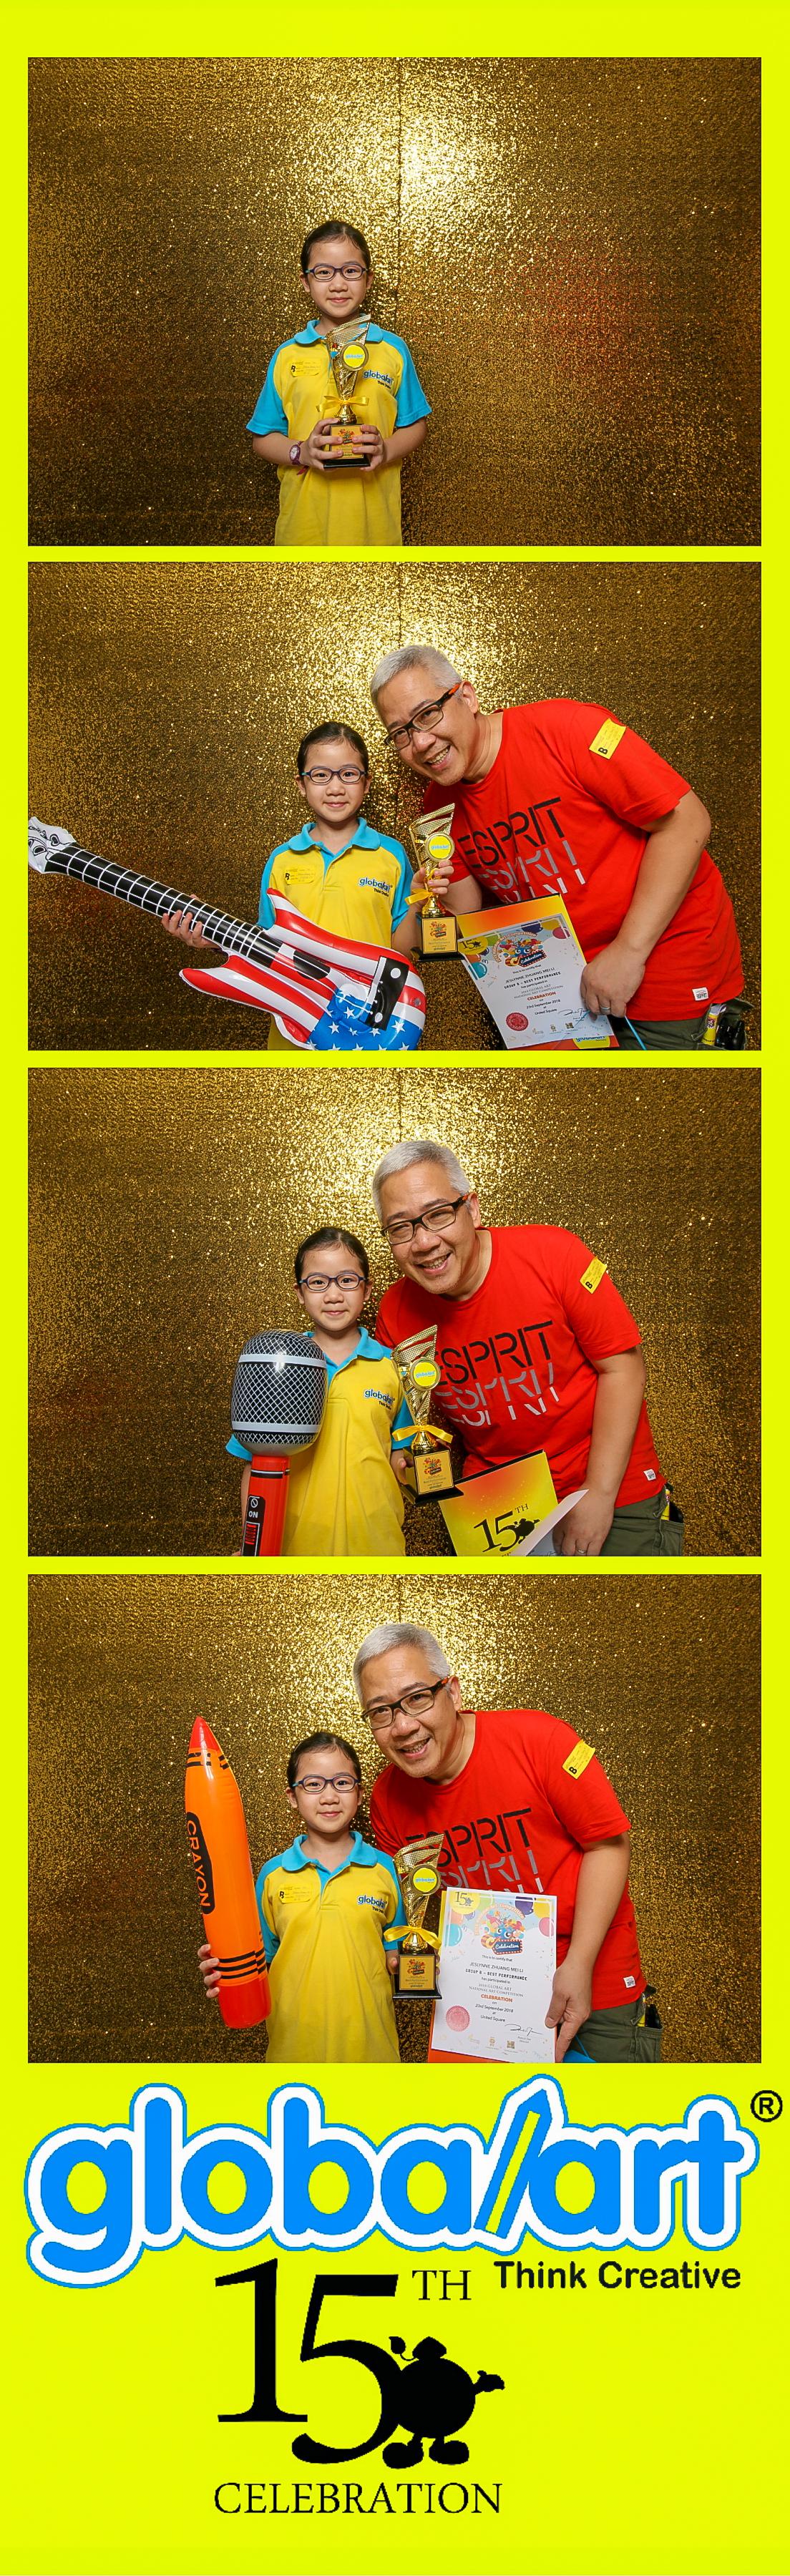 global art photo booth singapore (29)